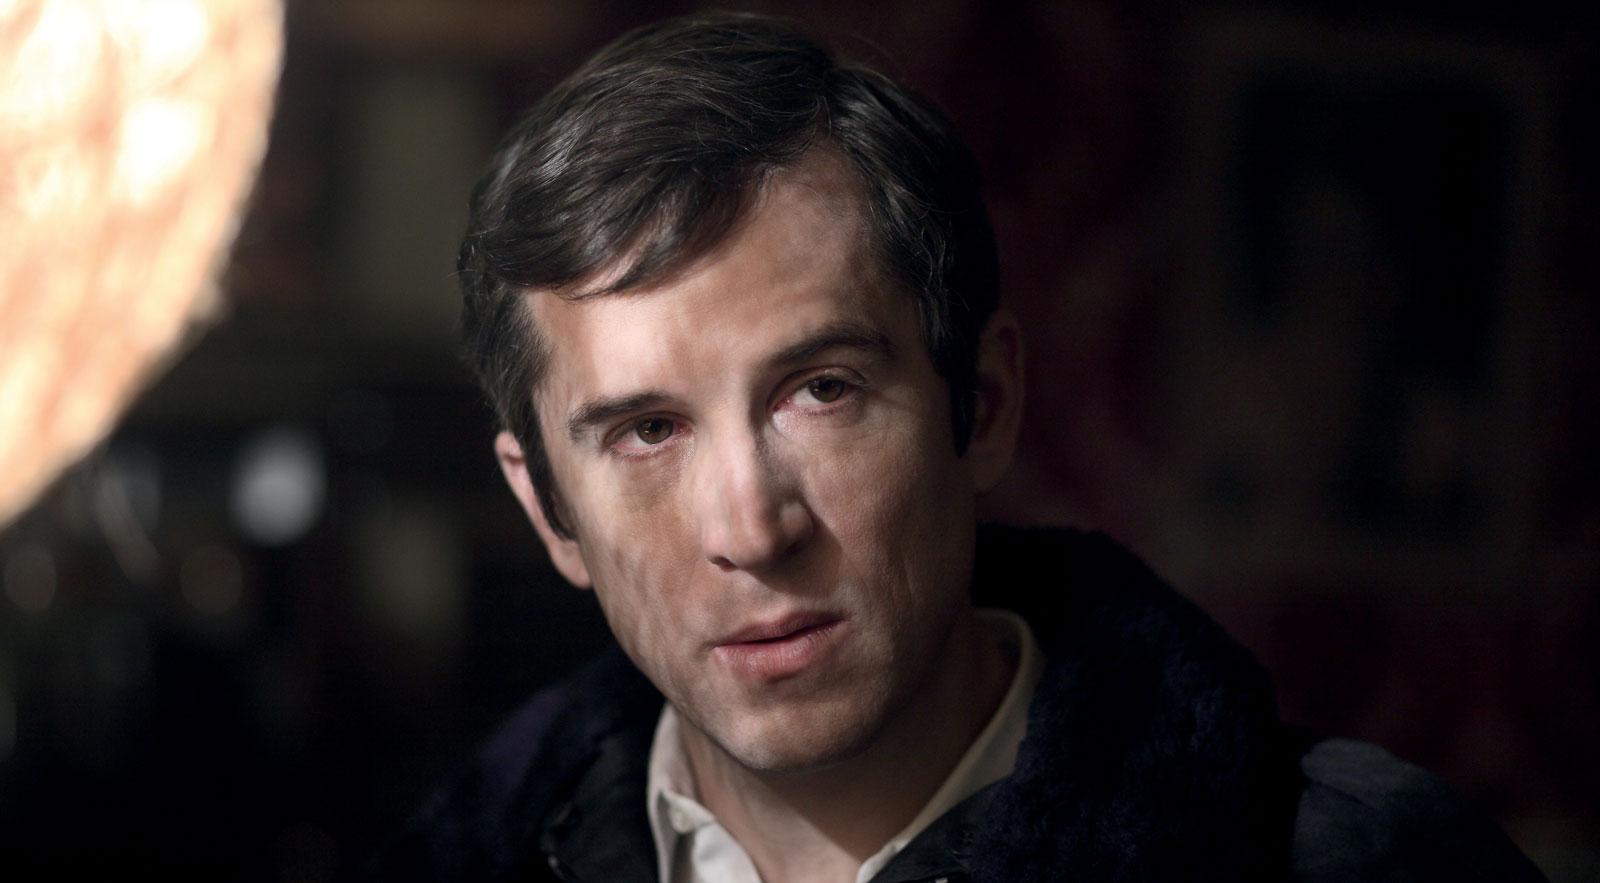 Next time I'll aim for the heart: il protagonista del film Guillaume Canet in una scena